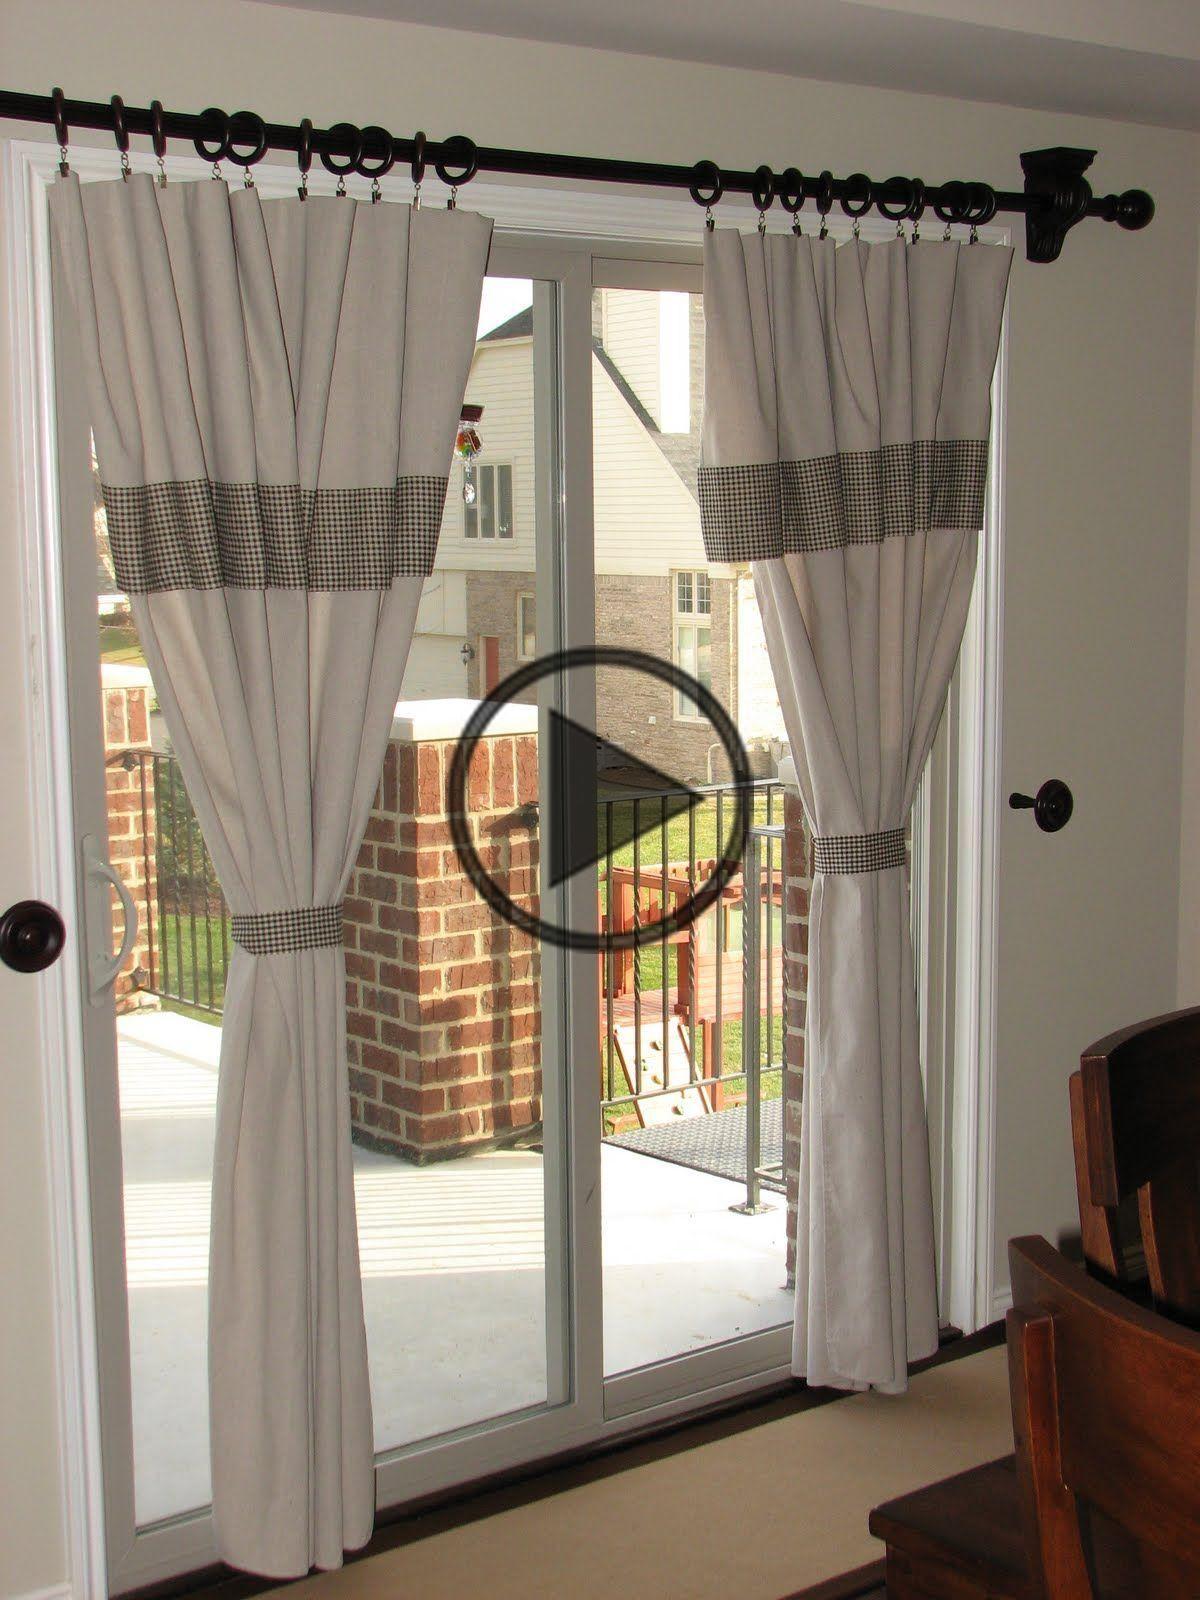 Life on Nickelby DIY kitchen curtains en 2020 Madera